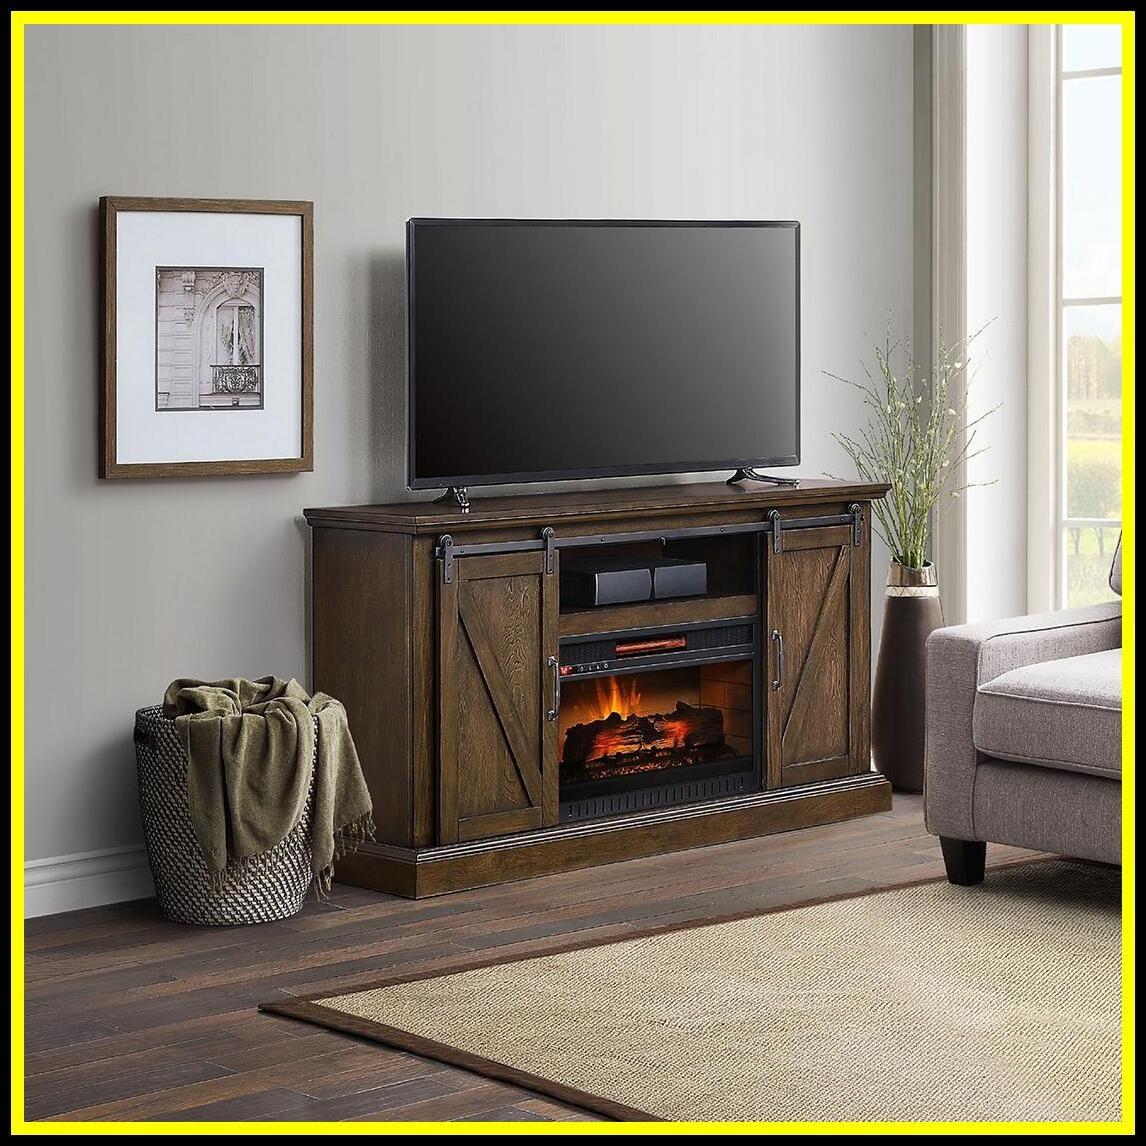 159b5327dbf37b86479f8f82936d74b2 - Better Homes And Gardens Ashwood Road Media Fireplace